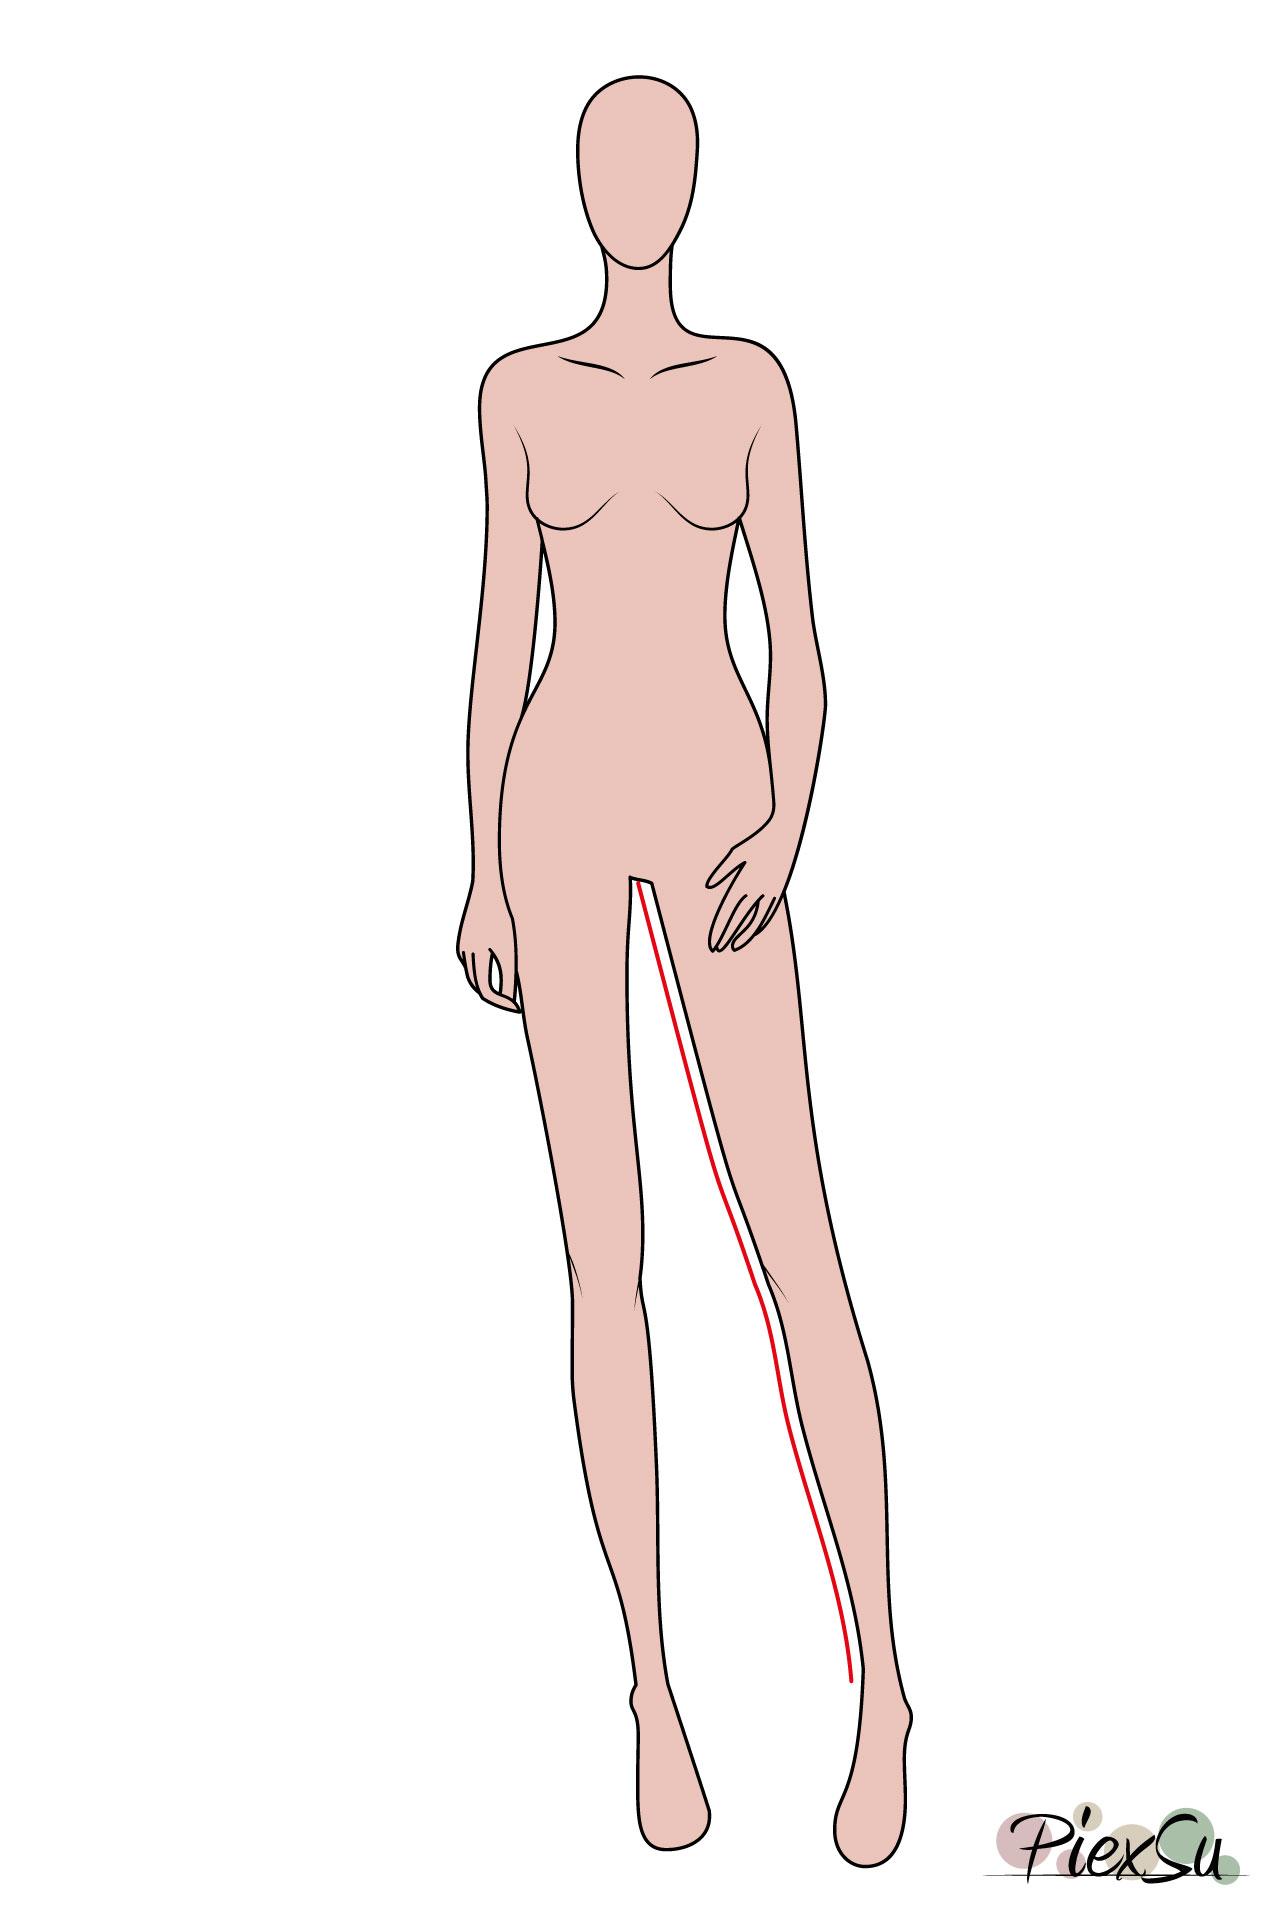 PiexSu-Maß-nehmen-messen-Schnittmuster-nähen-Nähanleitung-Innenbeinlänge